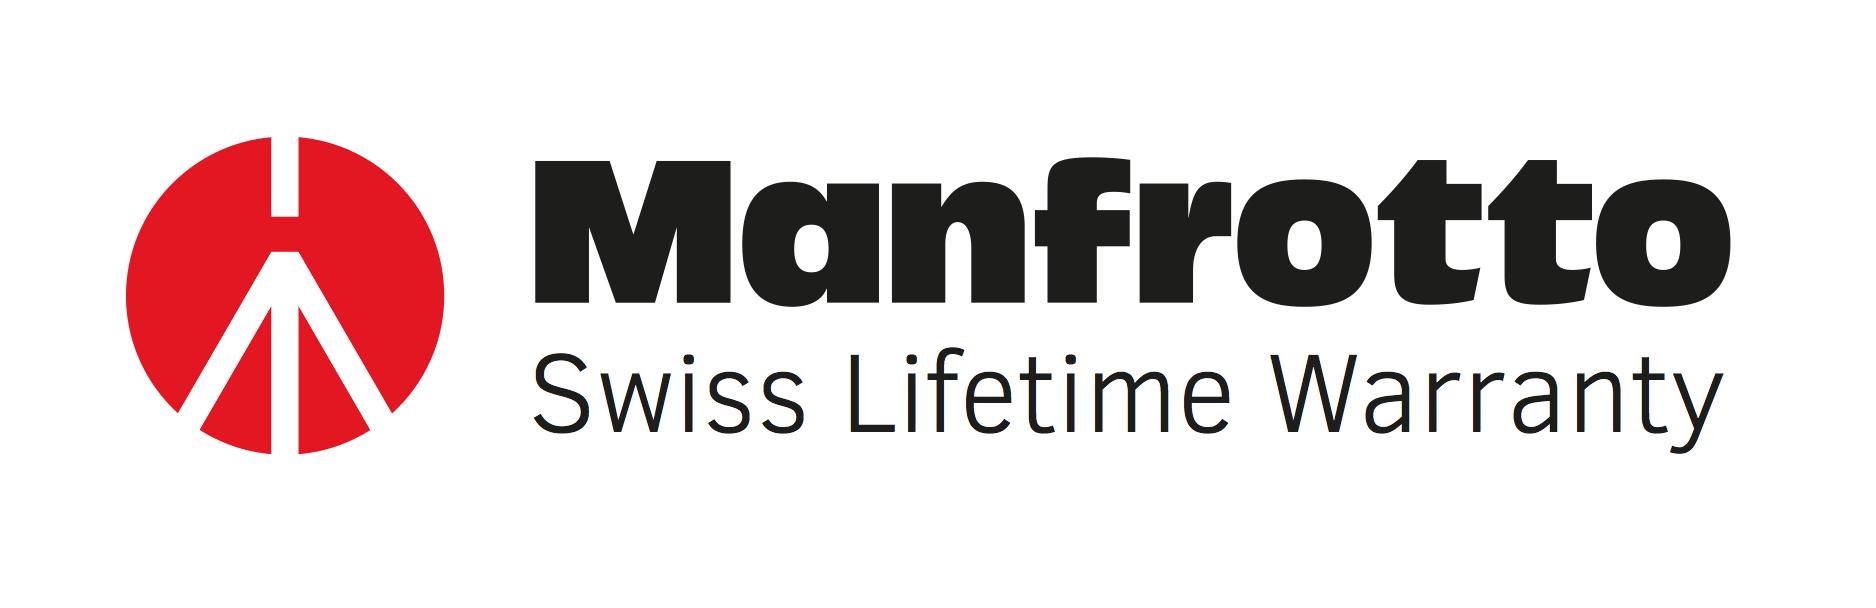 Manfrotto Swiss Lifetime Warranty